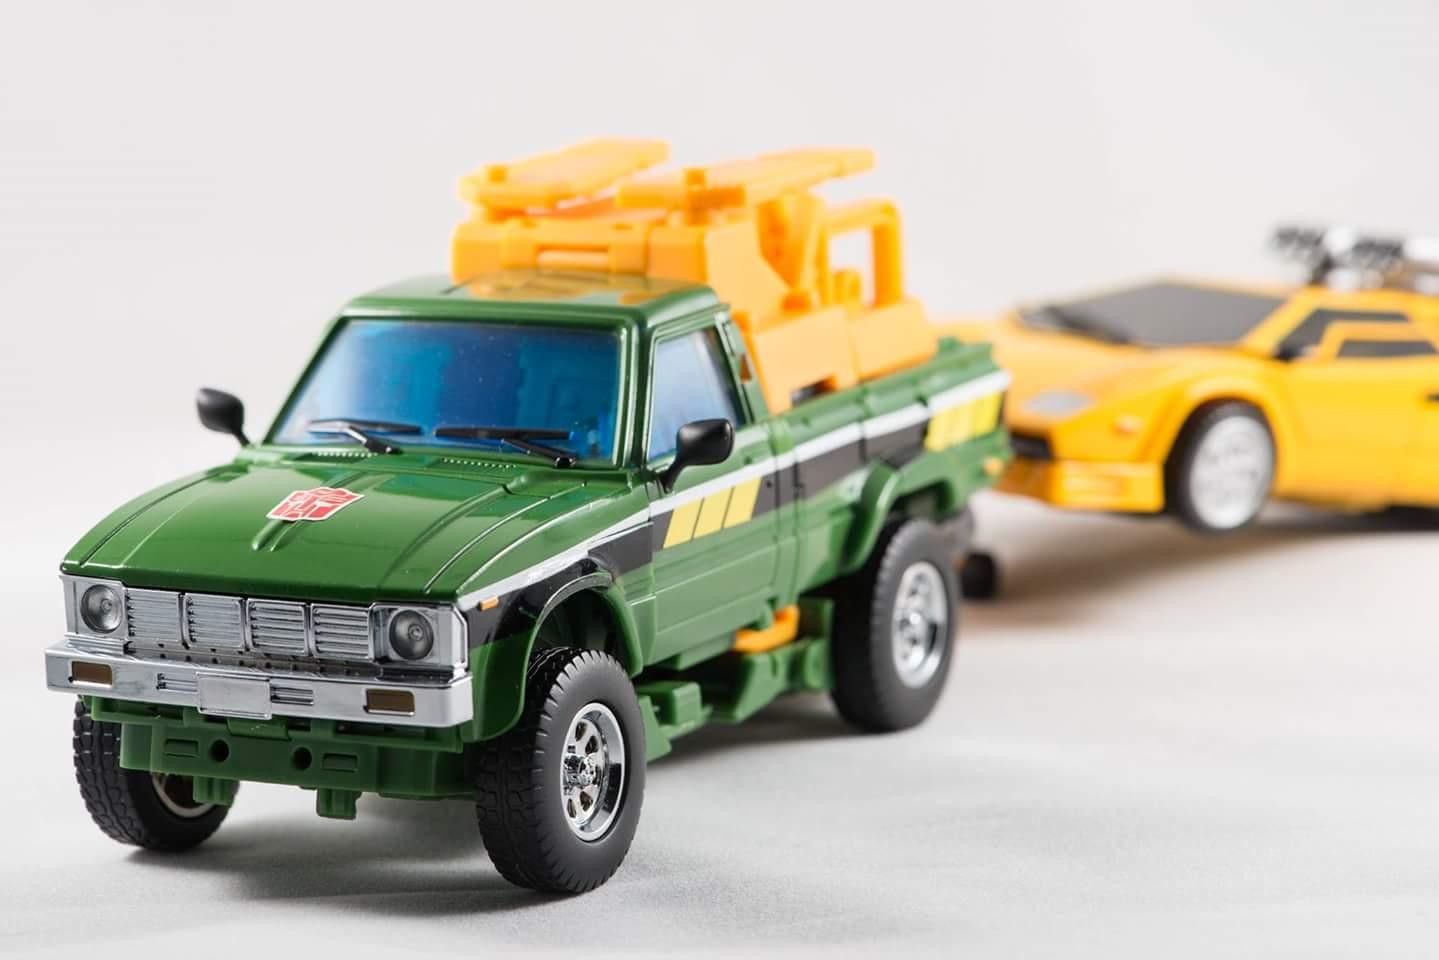 [BadCube] Produit Tiers - Jouet OTS-12 Lorry - aka Hoist/Treuil UKKRwlIG